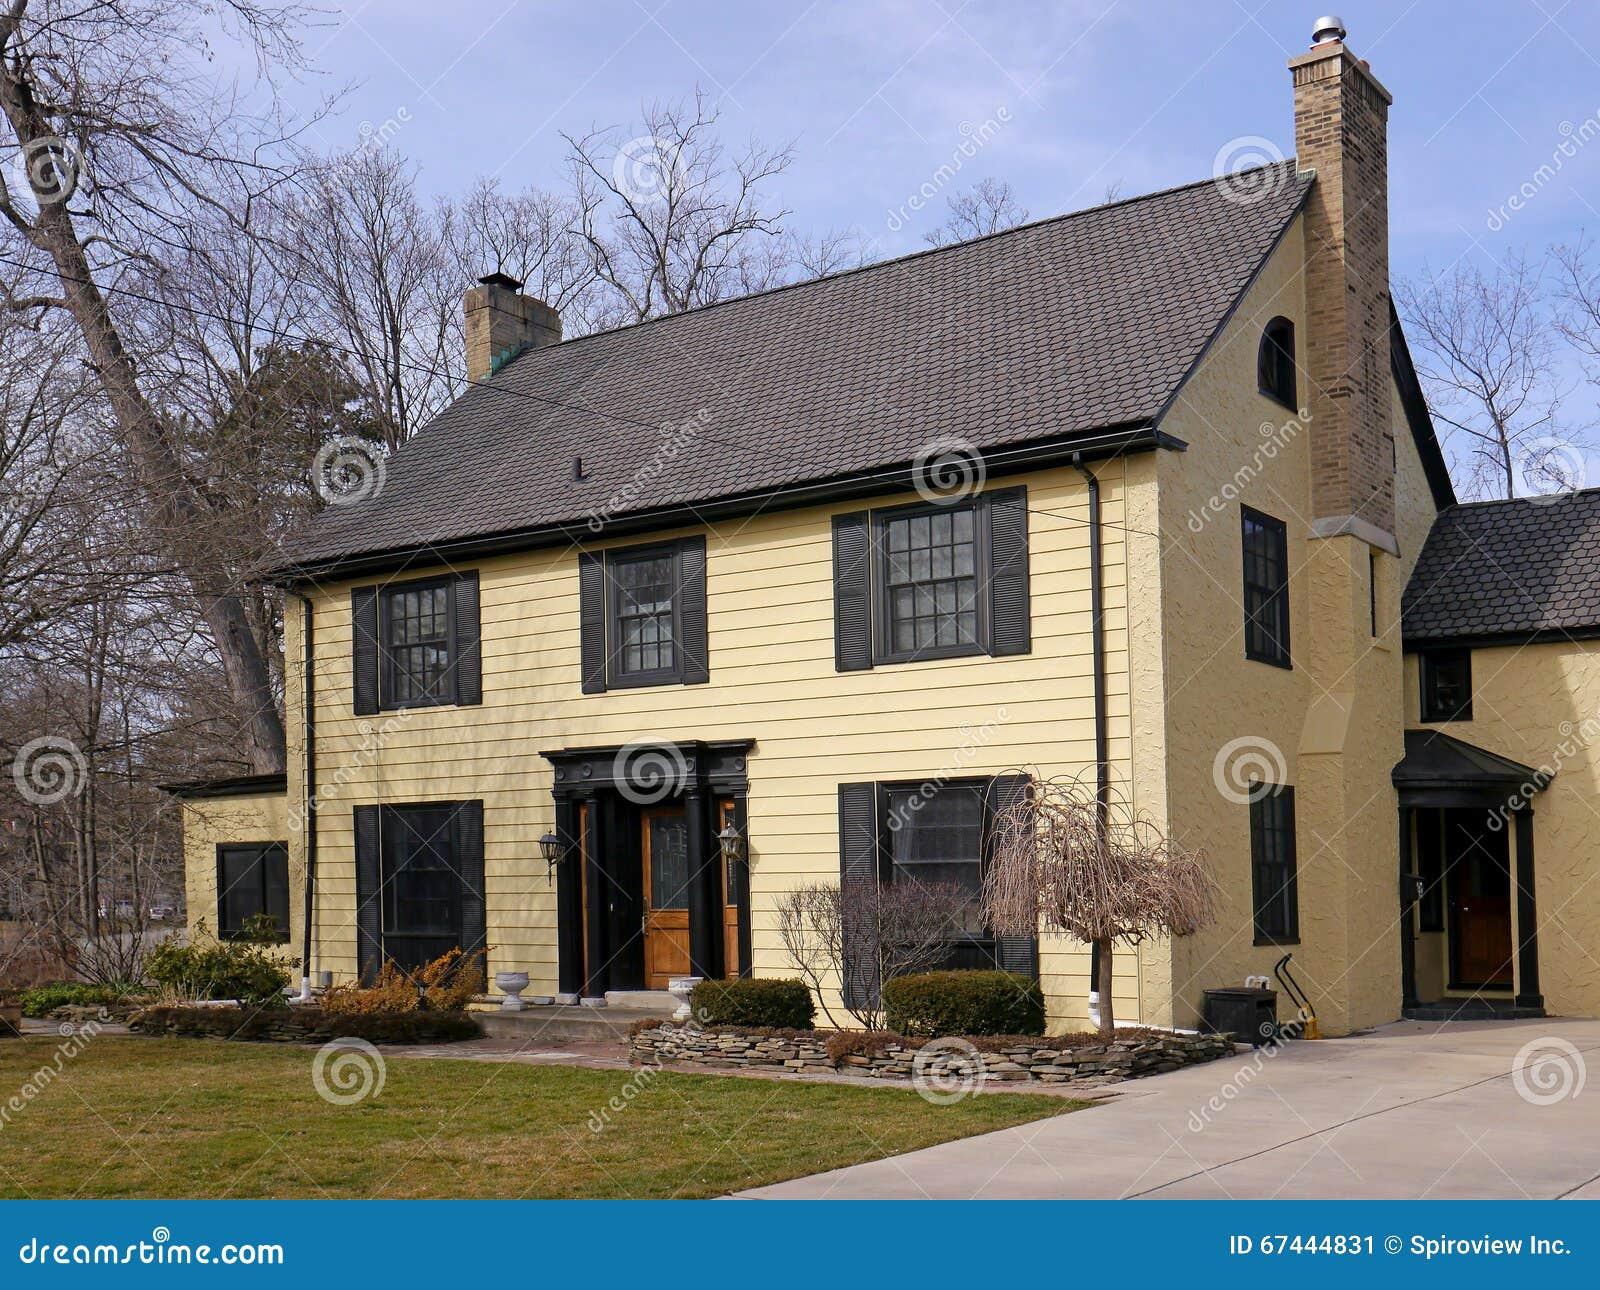 House With Yellow Siding Stock Image Image Of Large